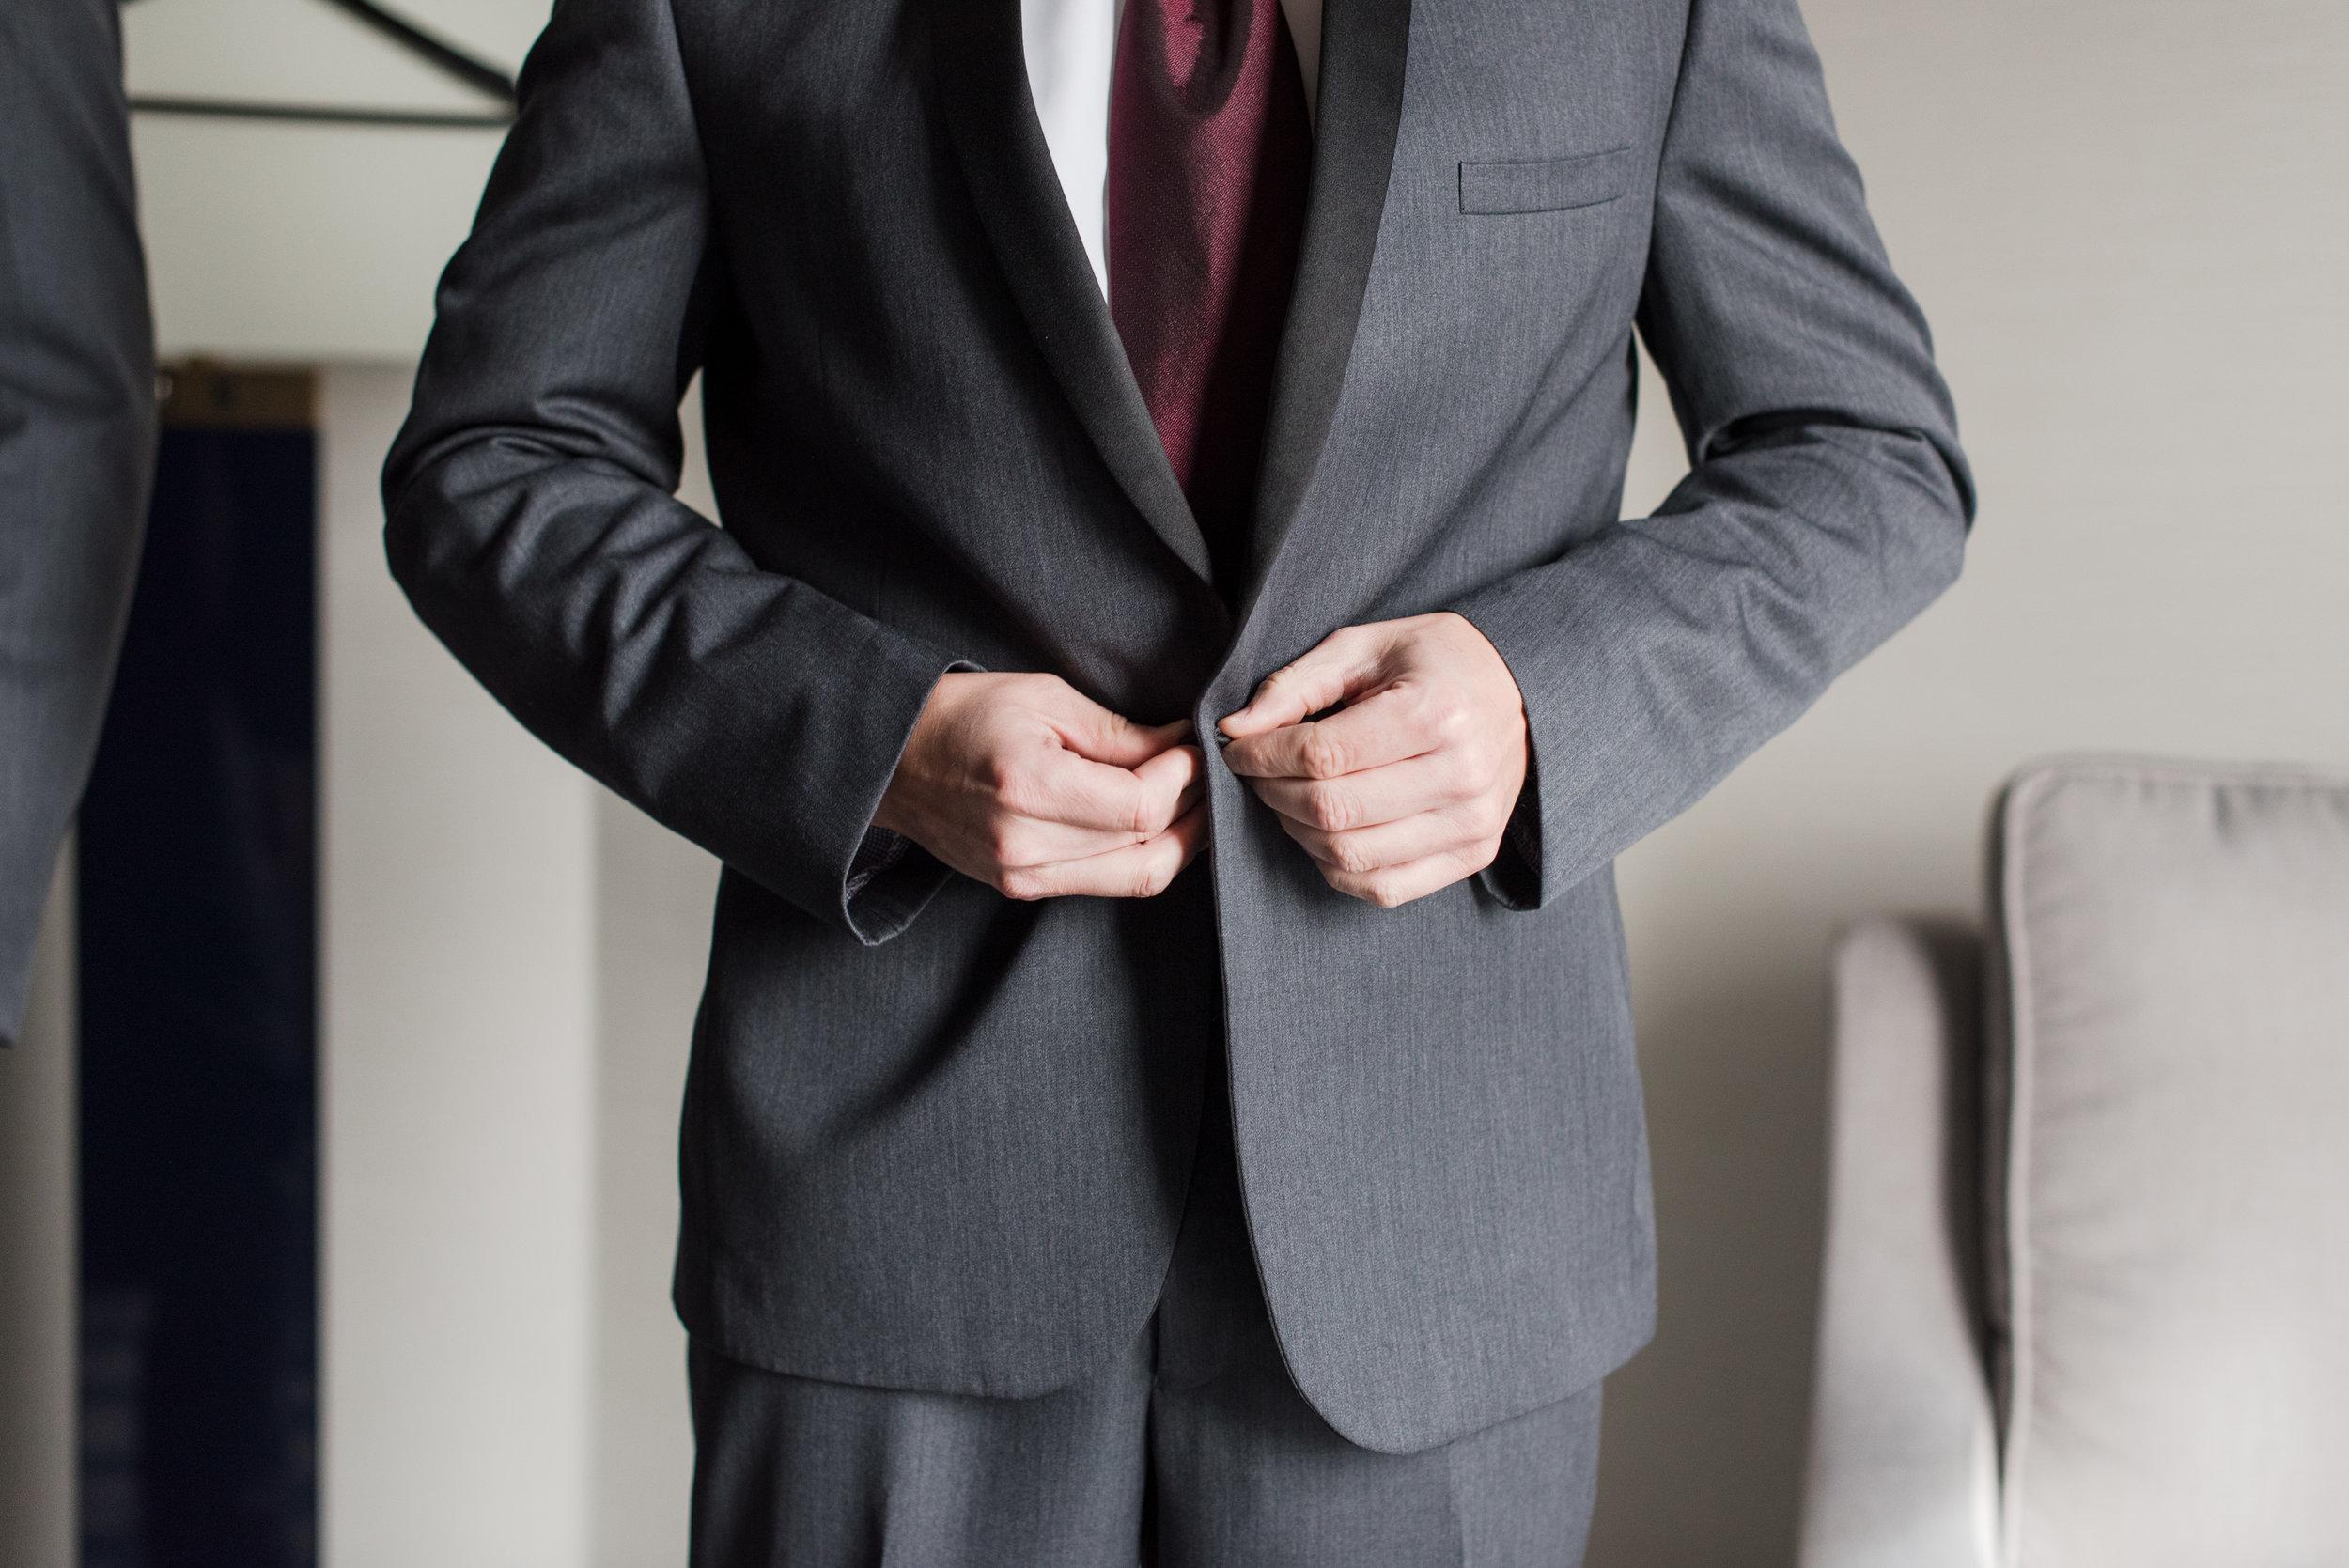 room putting on black and gray forum tuxedo jacket